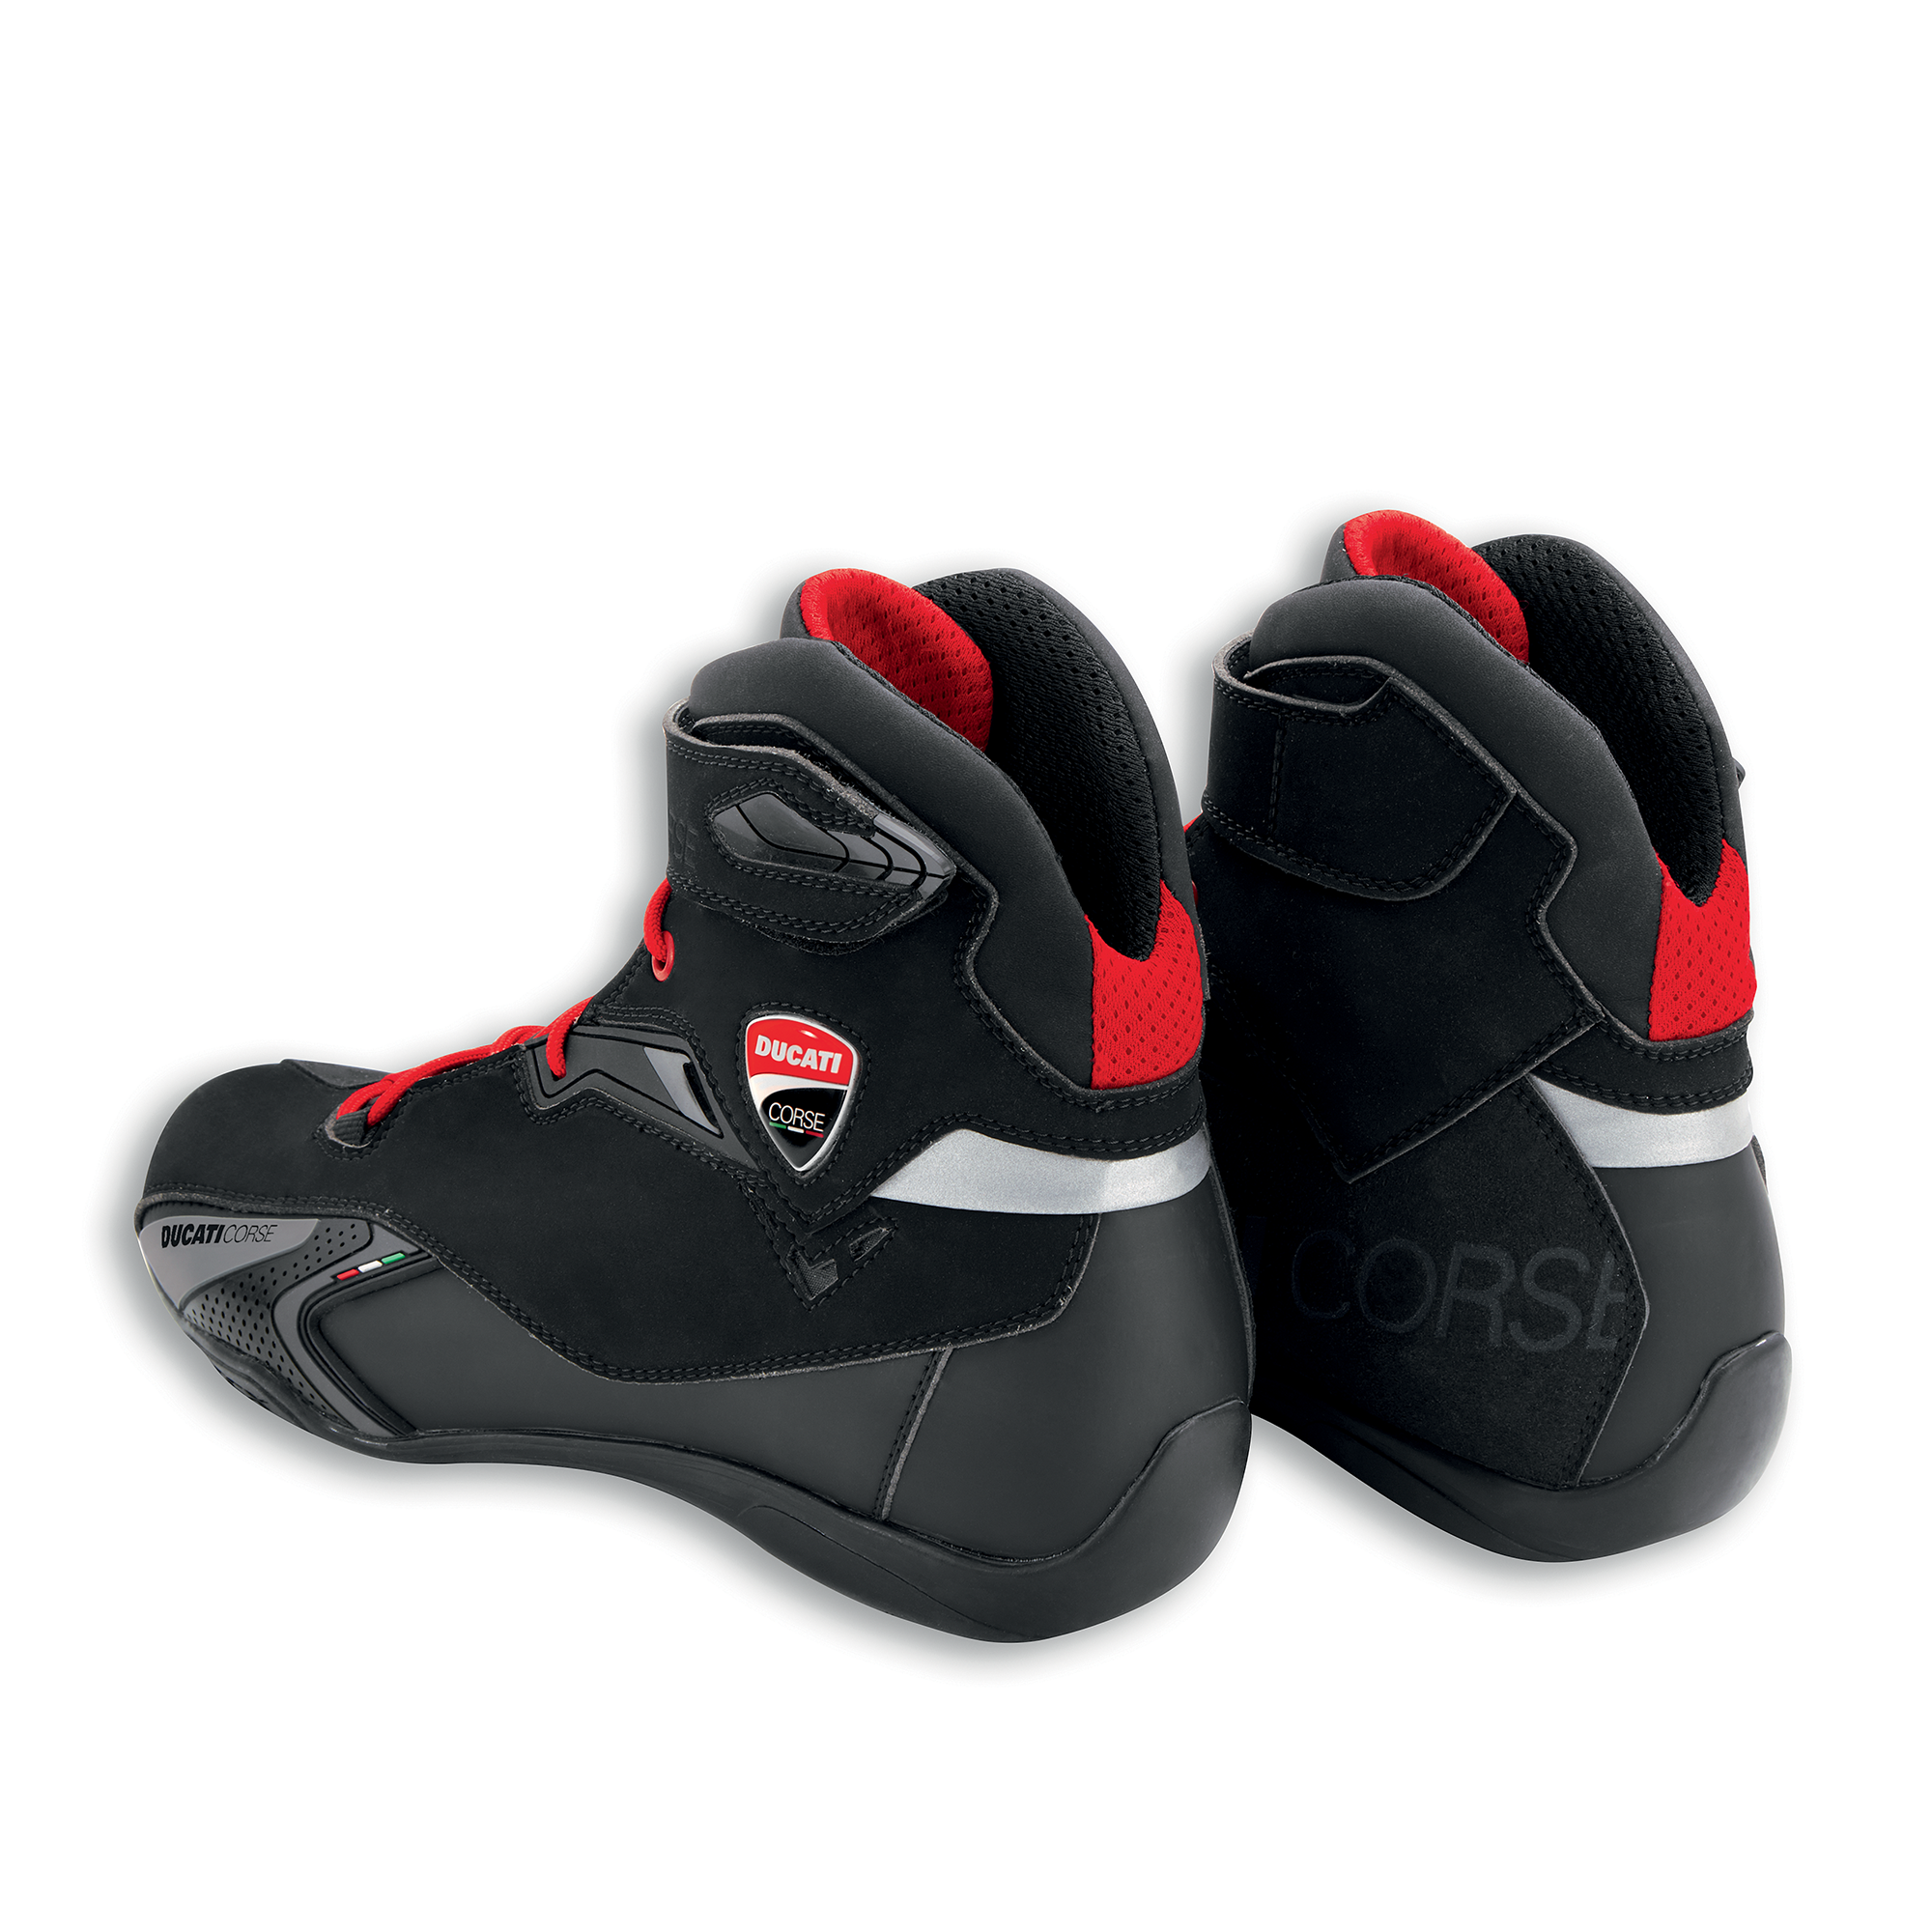 Ducati Corse City Technical shoes